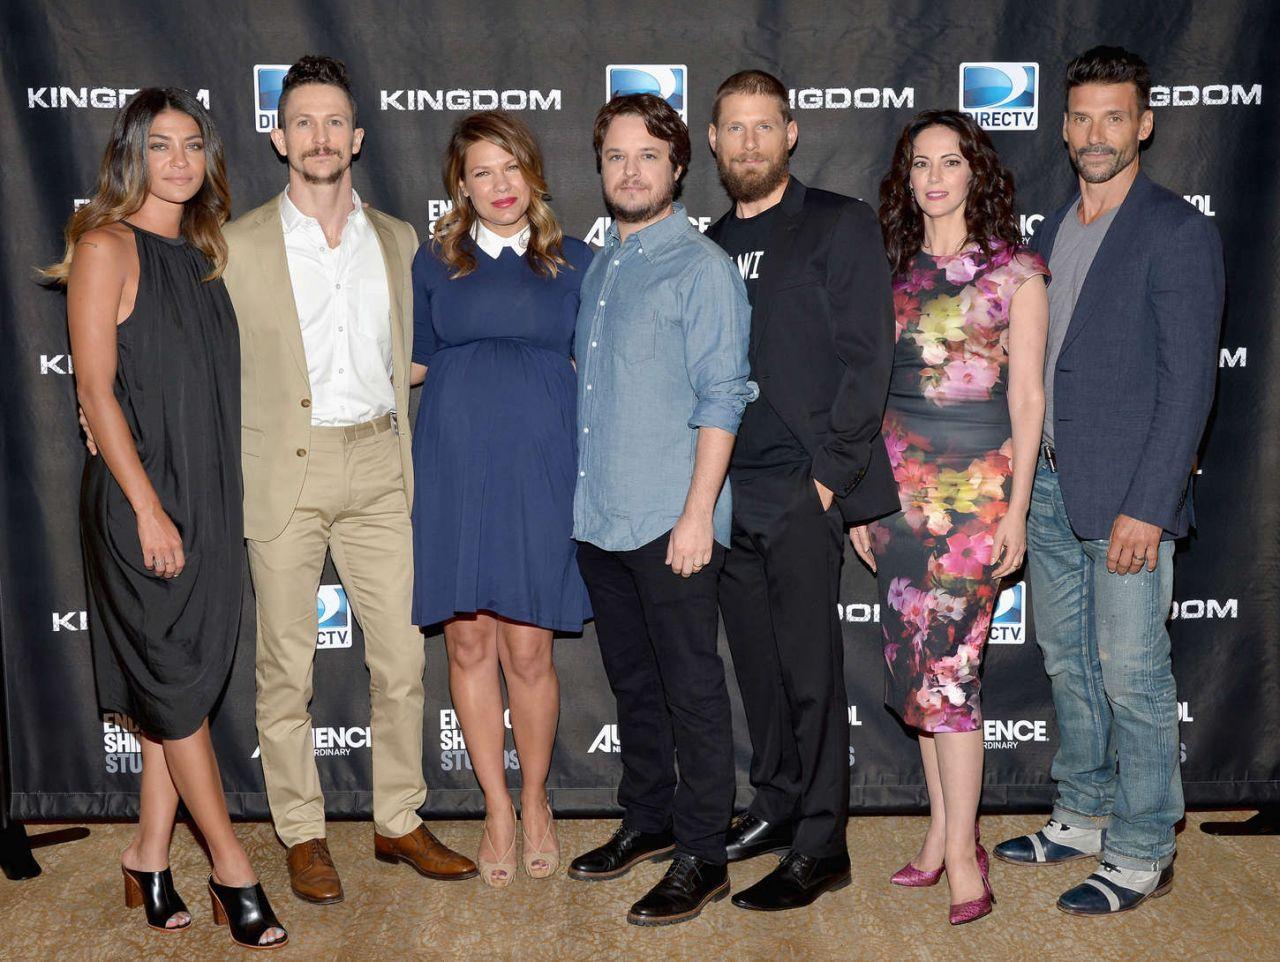 Jessica Szohr Directv Presents Season 2 Of Kingdom At